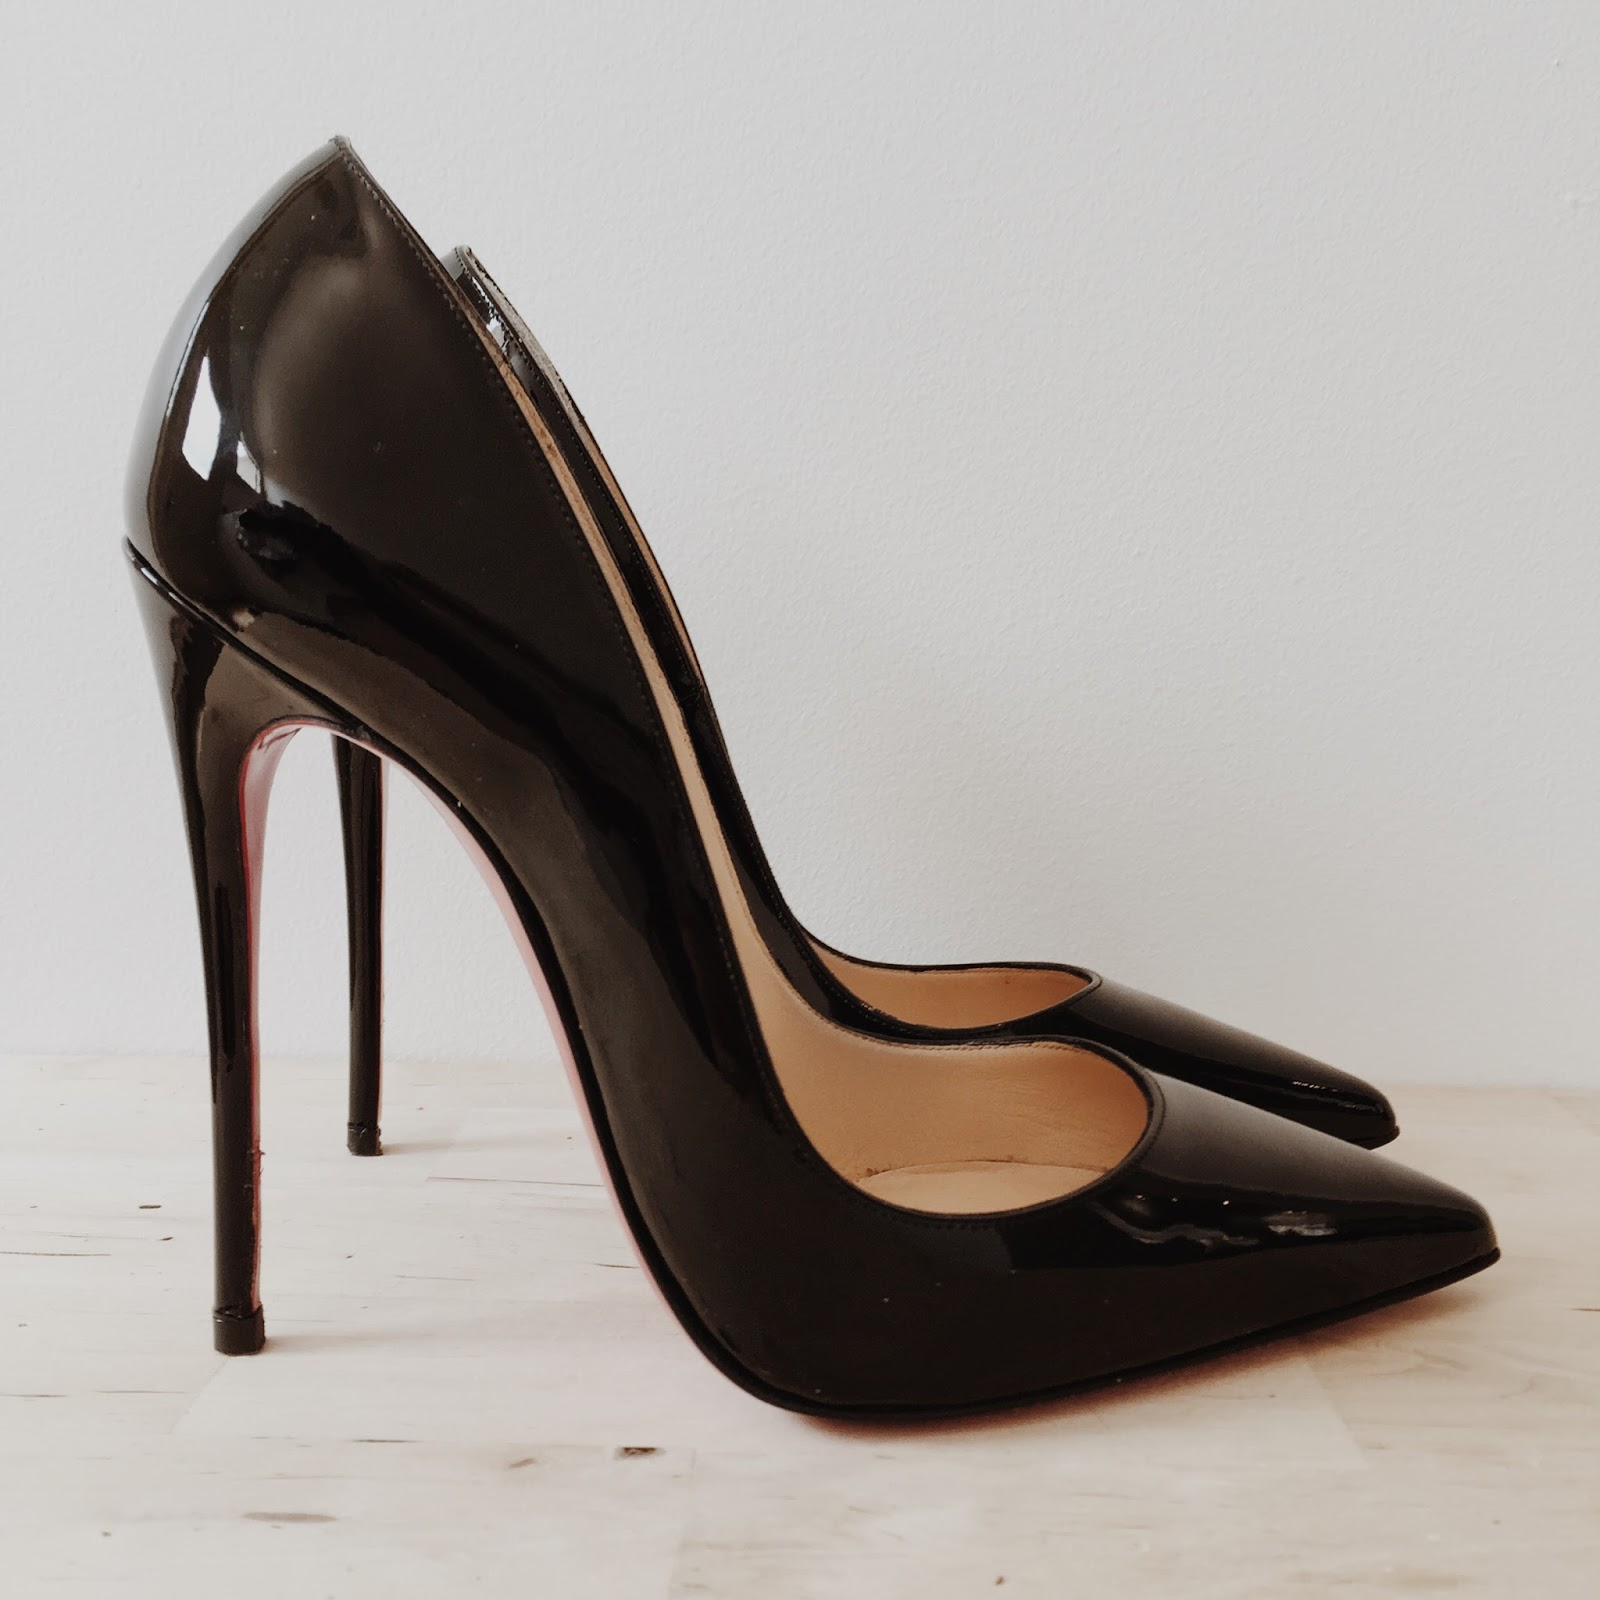 dad8a234cc04 J.N.  Review - Christian Louboutin So Kate 120mm Black Patent